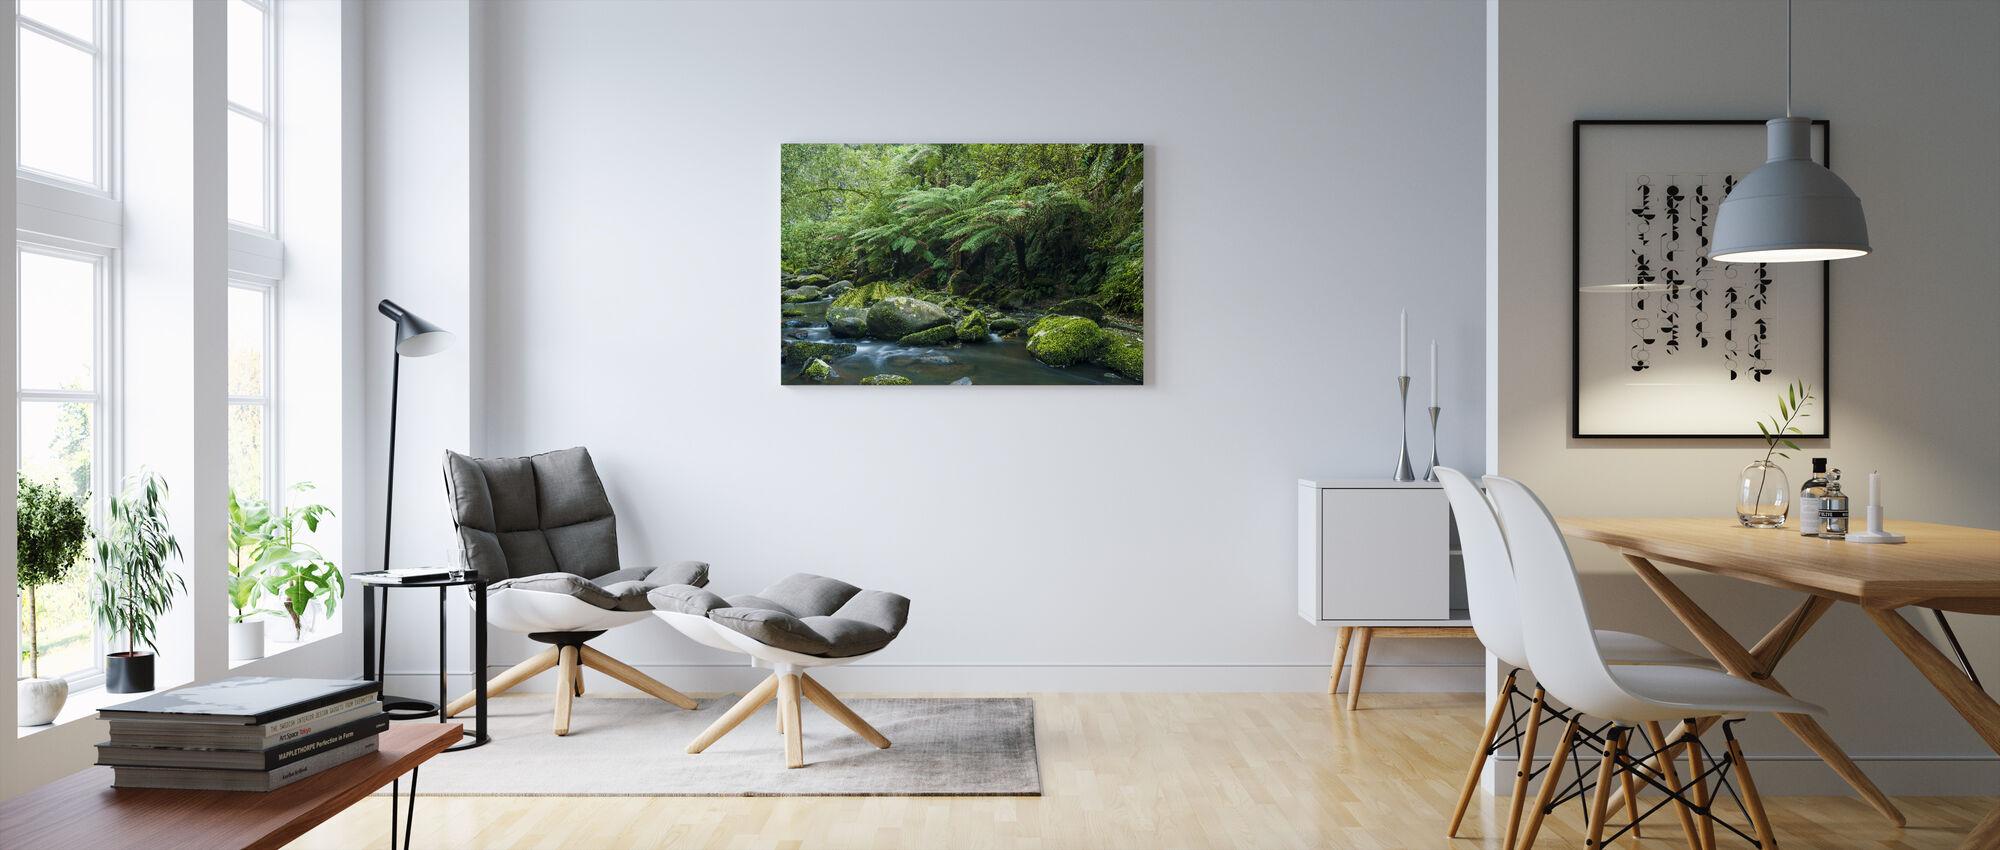 Nationaal park Great Otway - Canvas print - Woonkamer